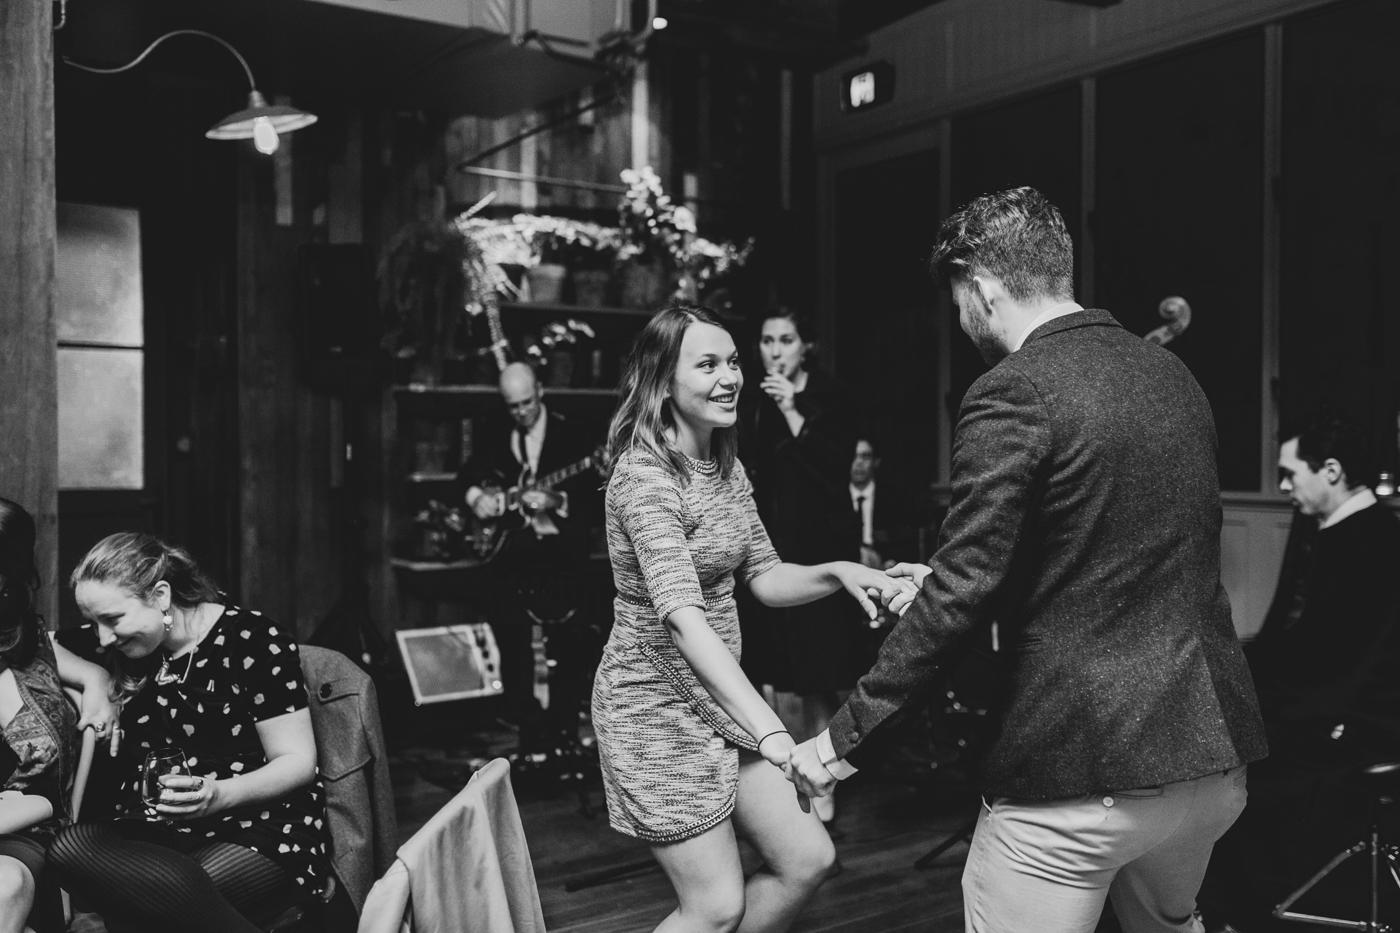 Jo & Tom Wedding - The Grounds of Alexandria - Samantha Heather Photography-345.jpg